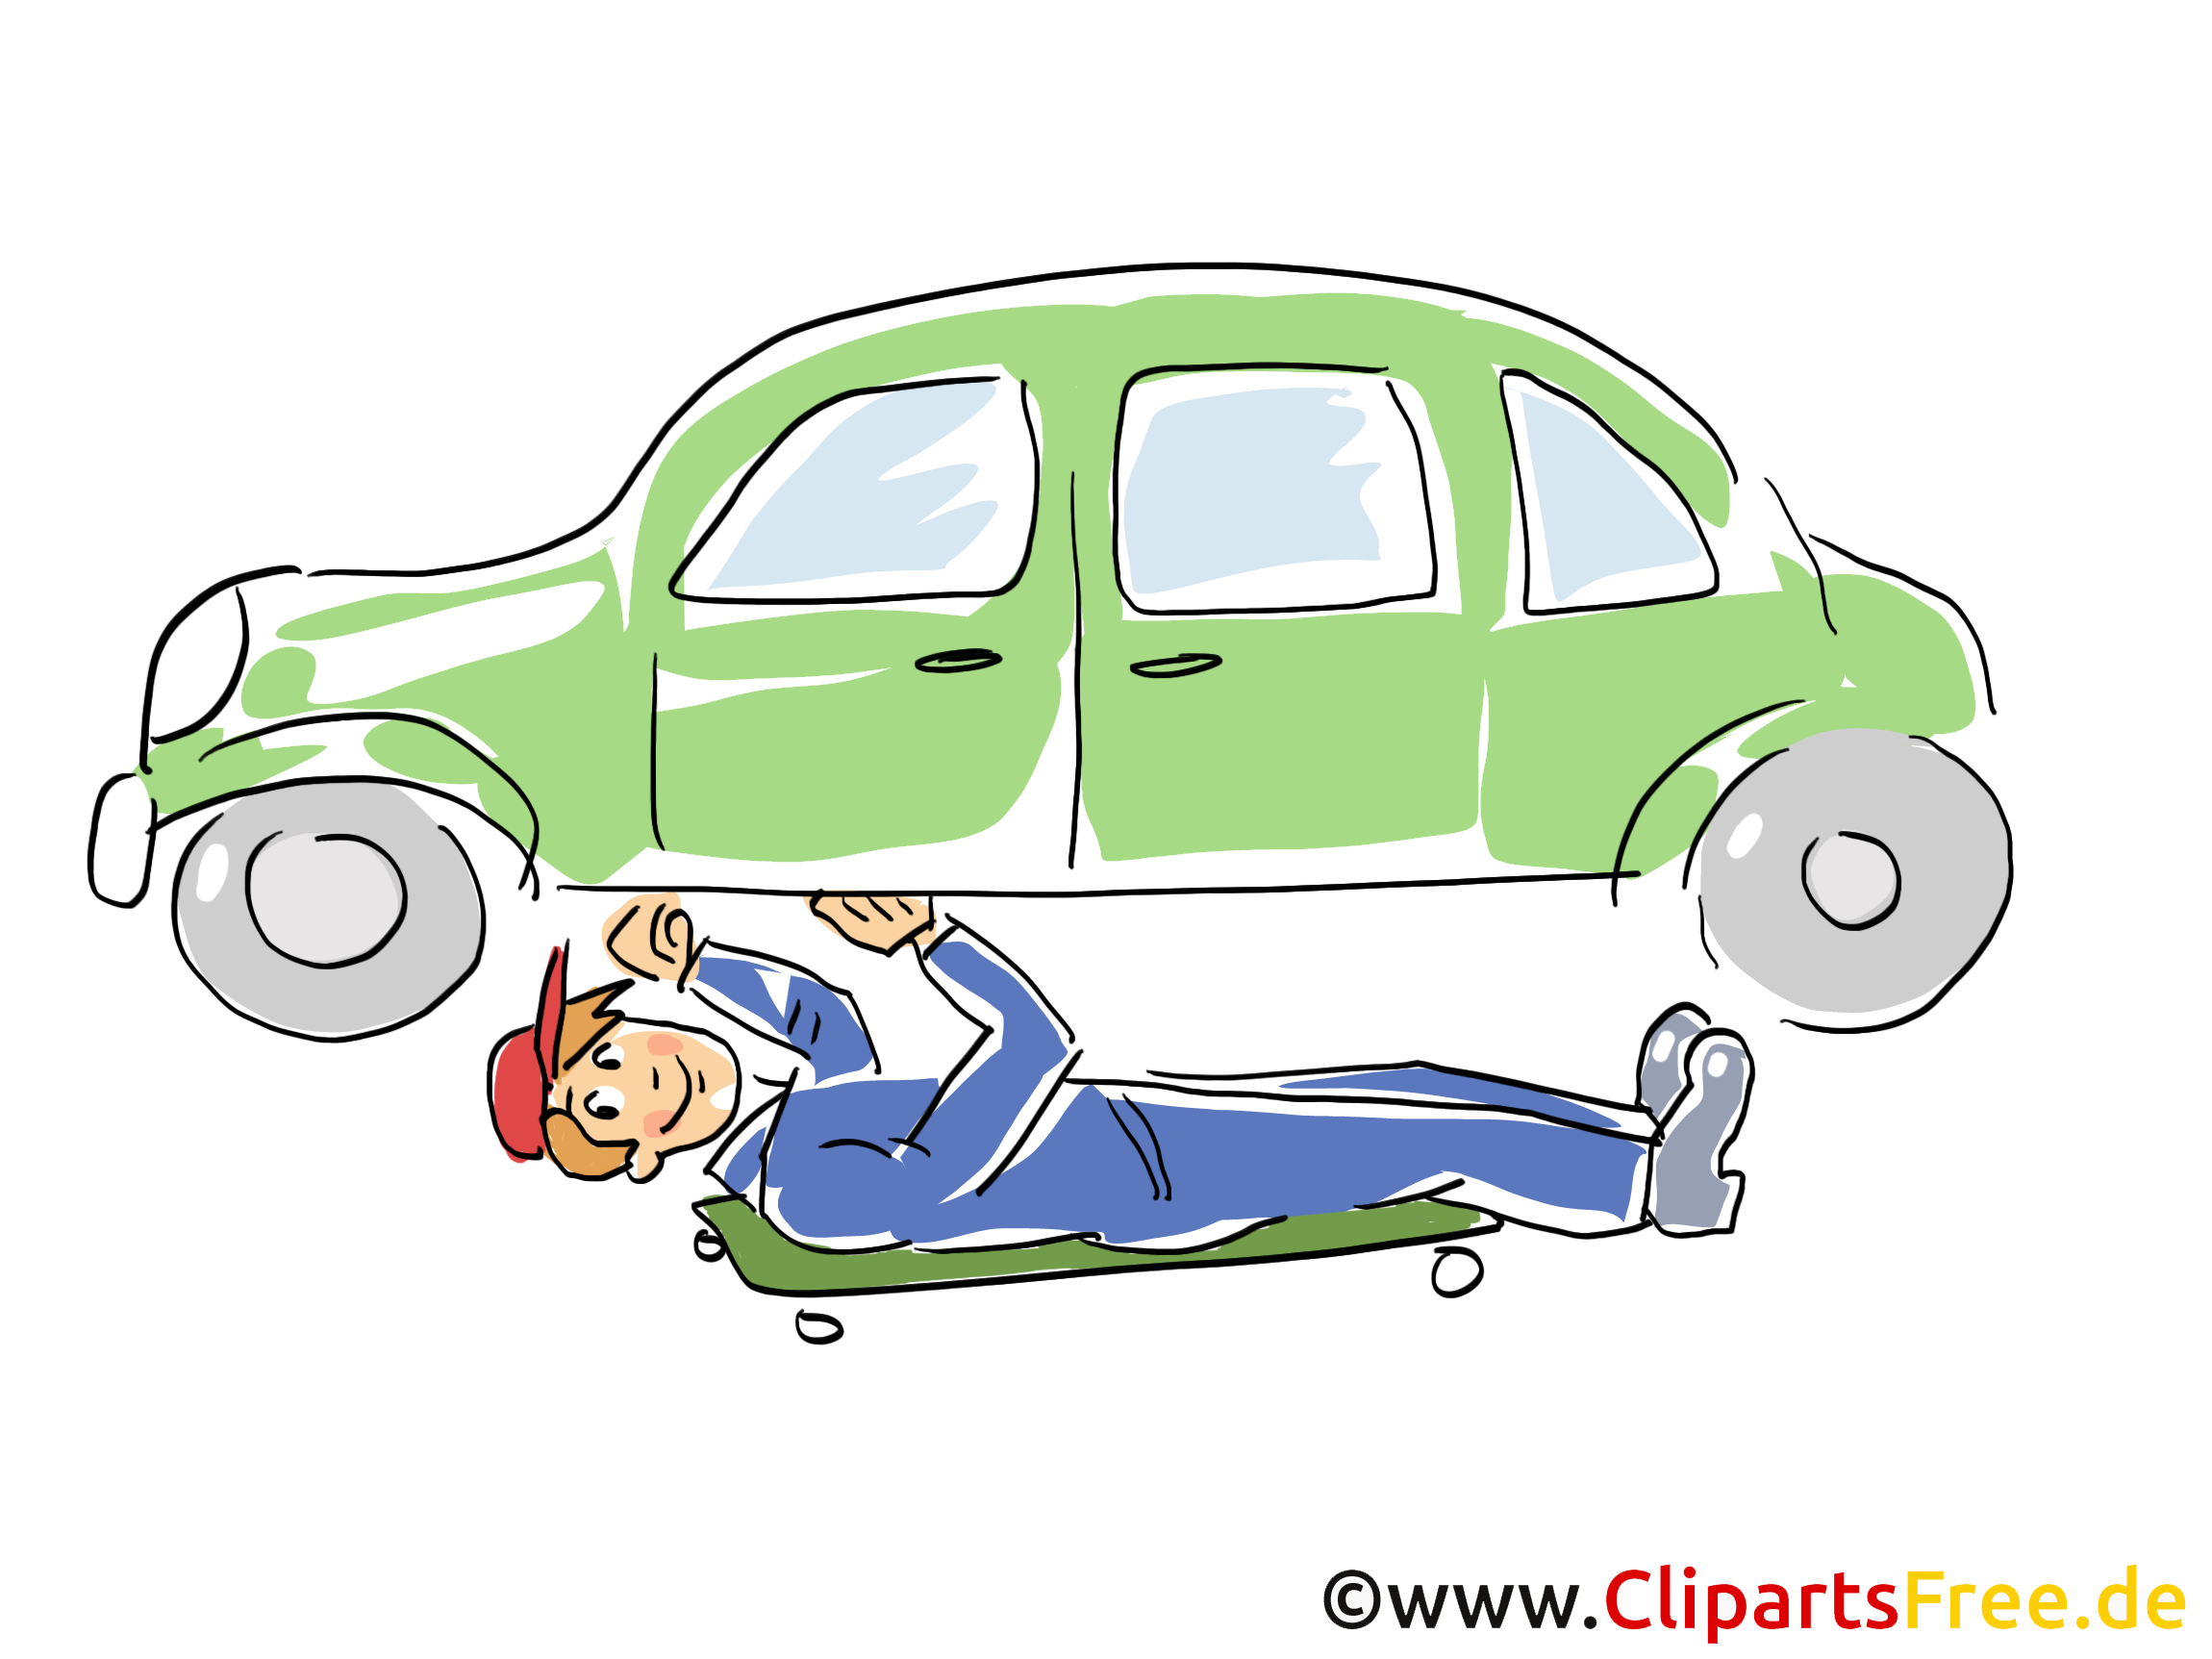 Auto selbst reparieren Clipart, Bild, Grafik, Cartoon, Illustration gratis